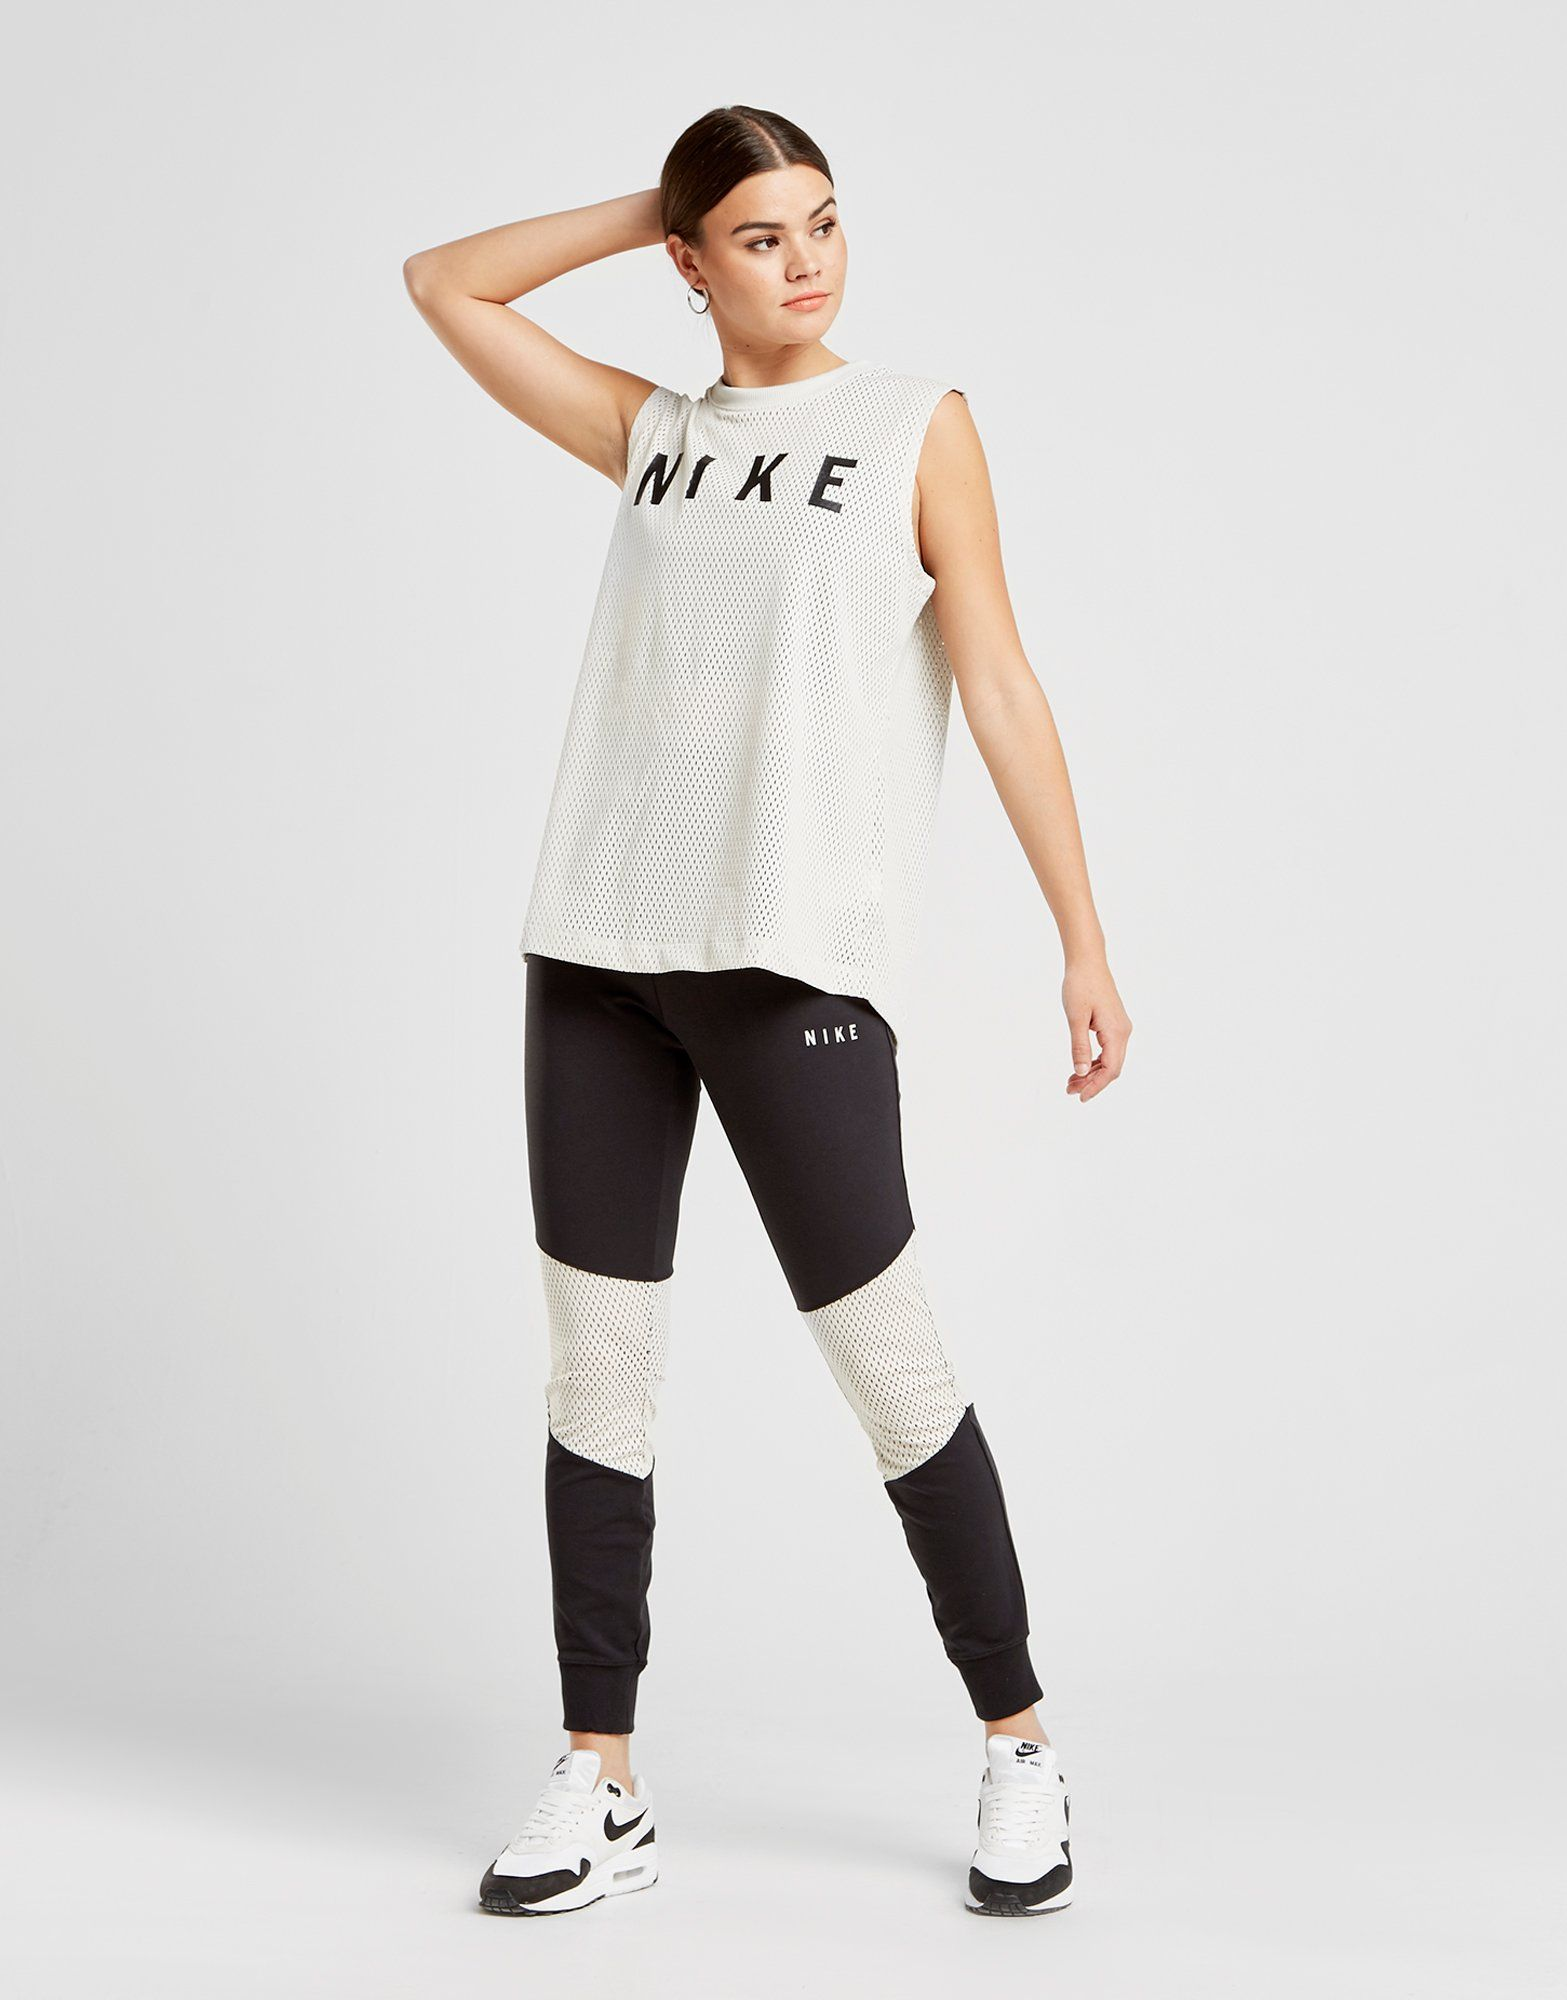 Liefern Nike Mesh Muscle Tank Top Weiss Rabatt Niedrigsten Preis Wirklich Günstiger Preis w23xbE7POP